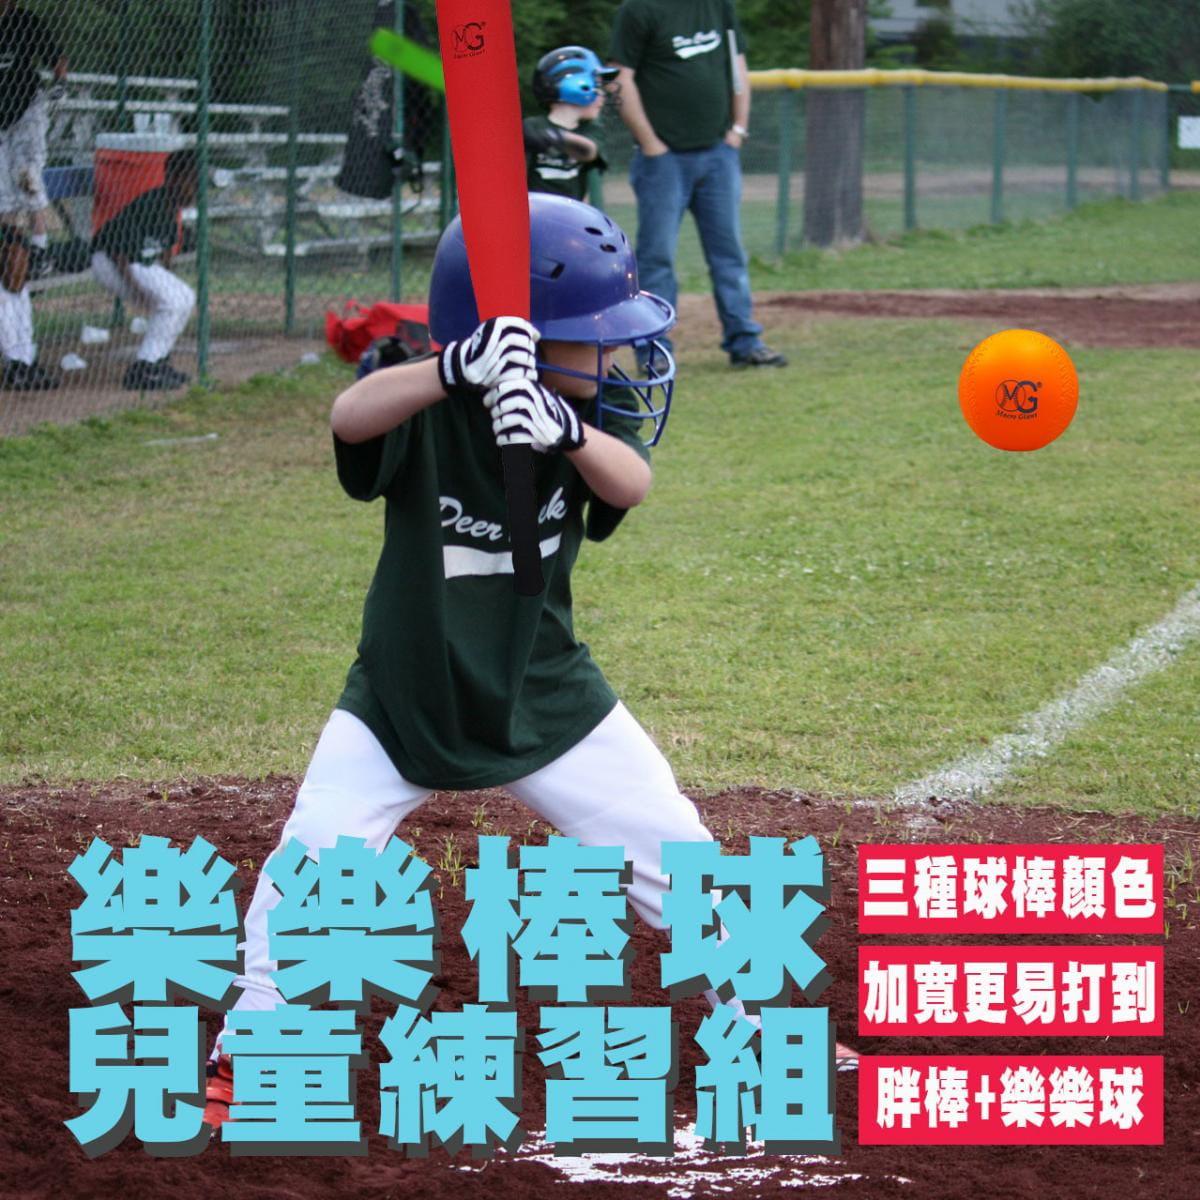 【MACRO GIANT】MIT 樂樂棒球兒童練習組 0